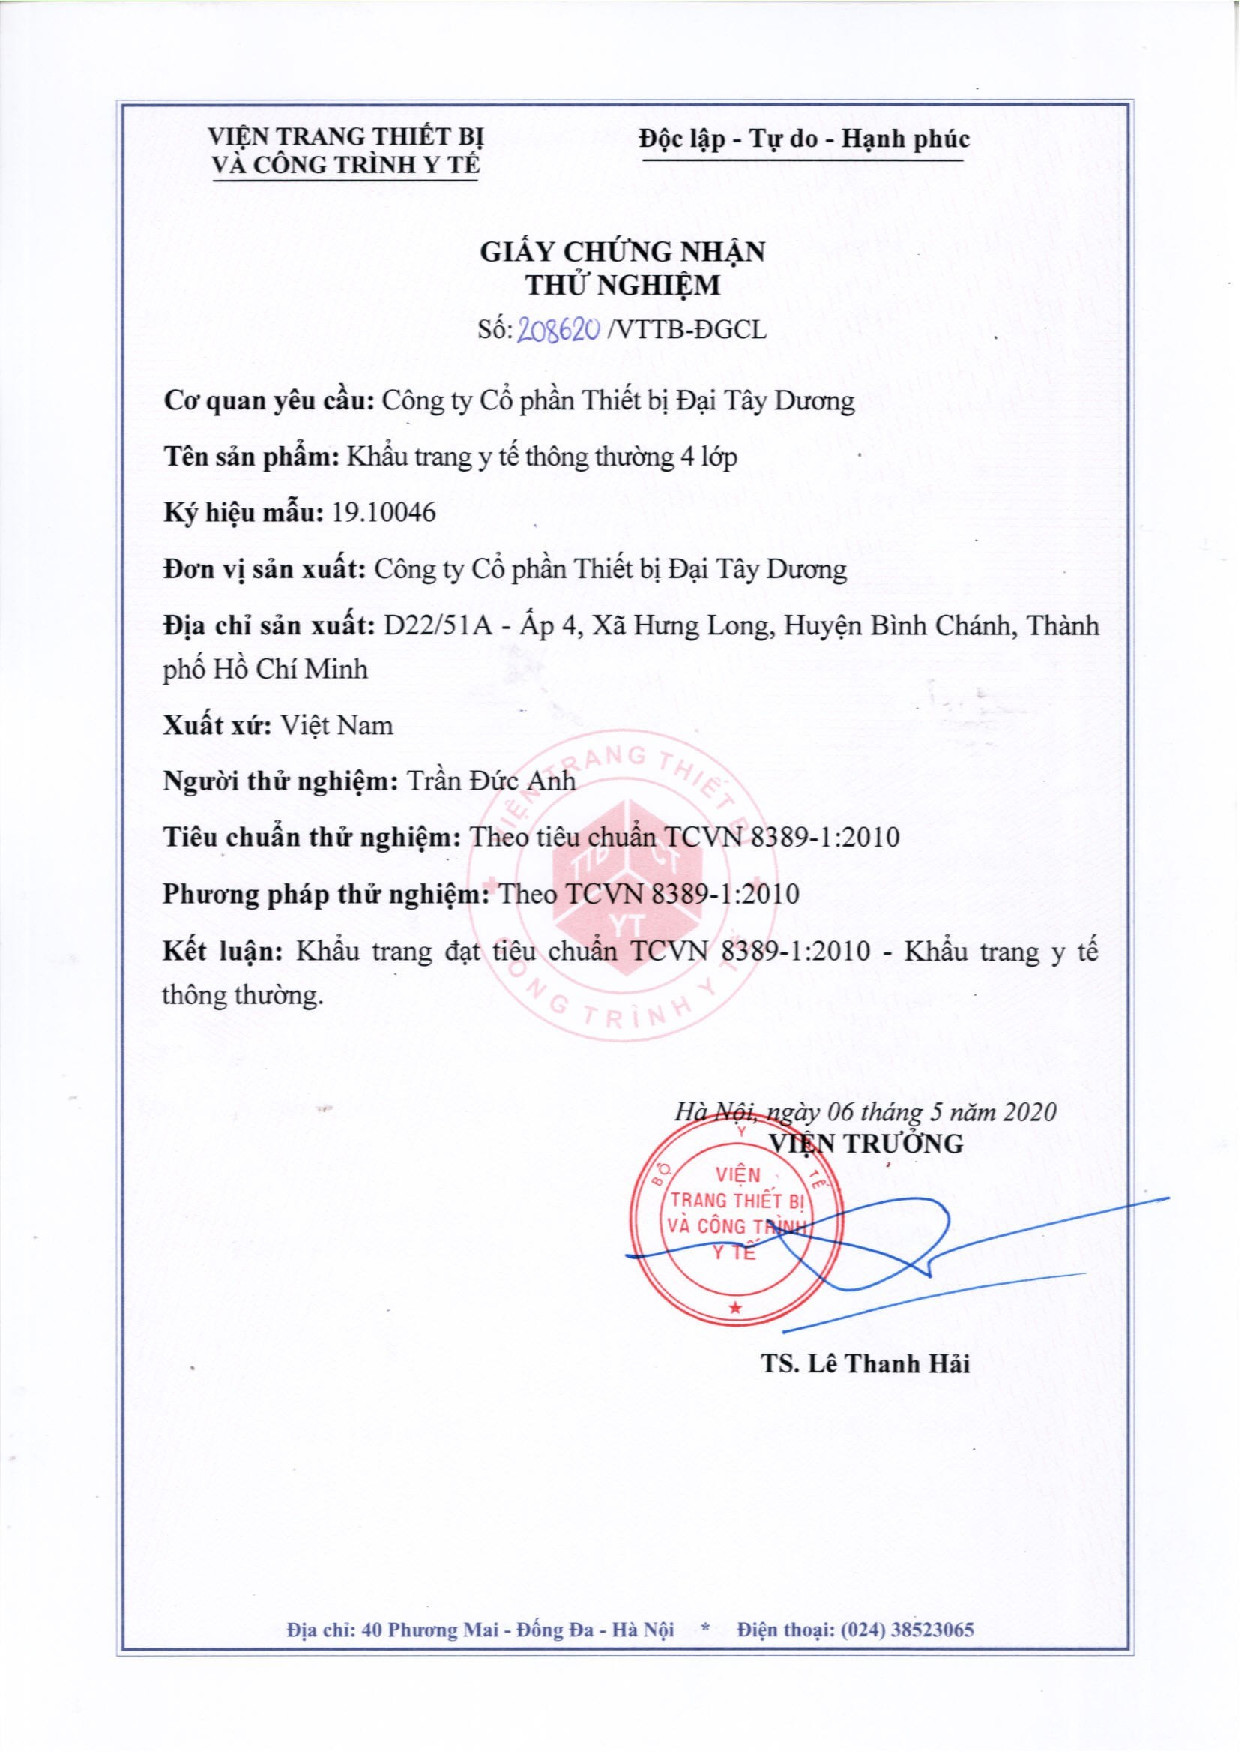 Test certification - KQ 208520